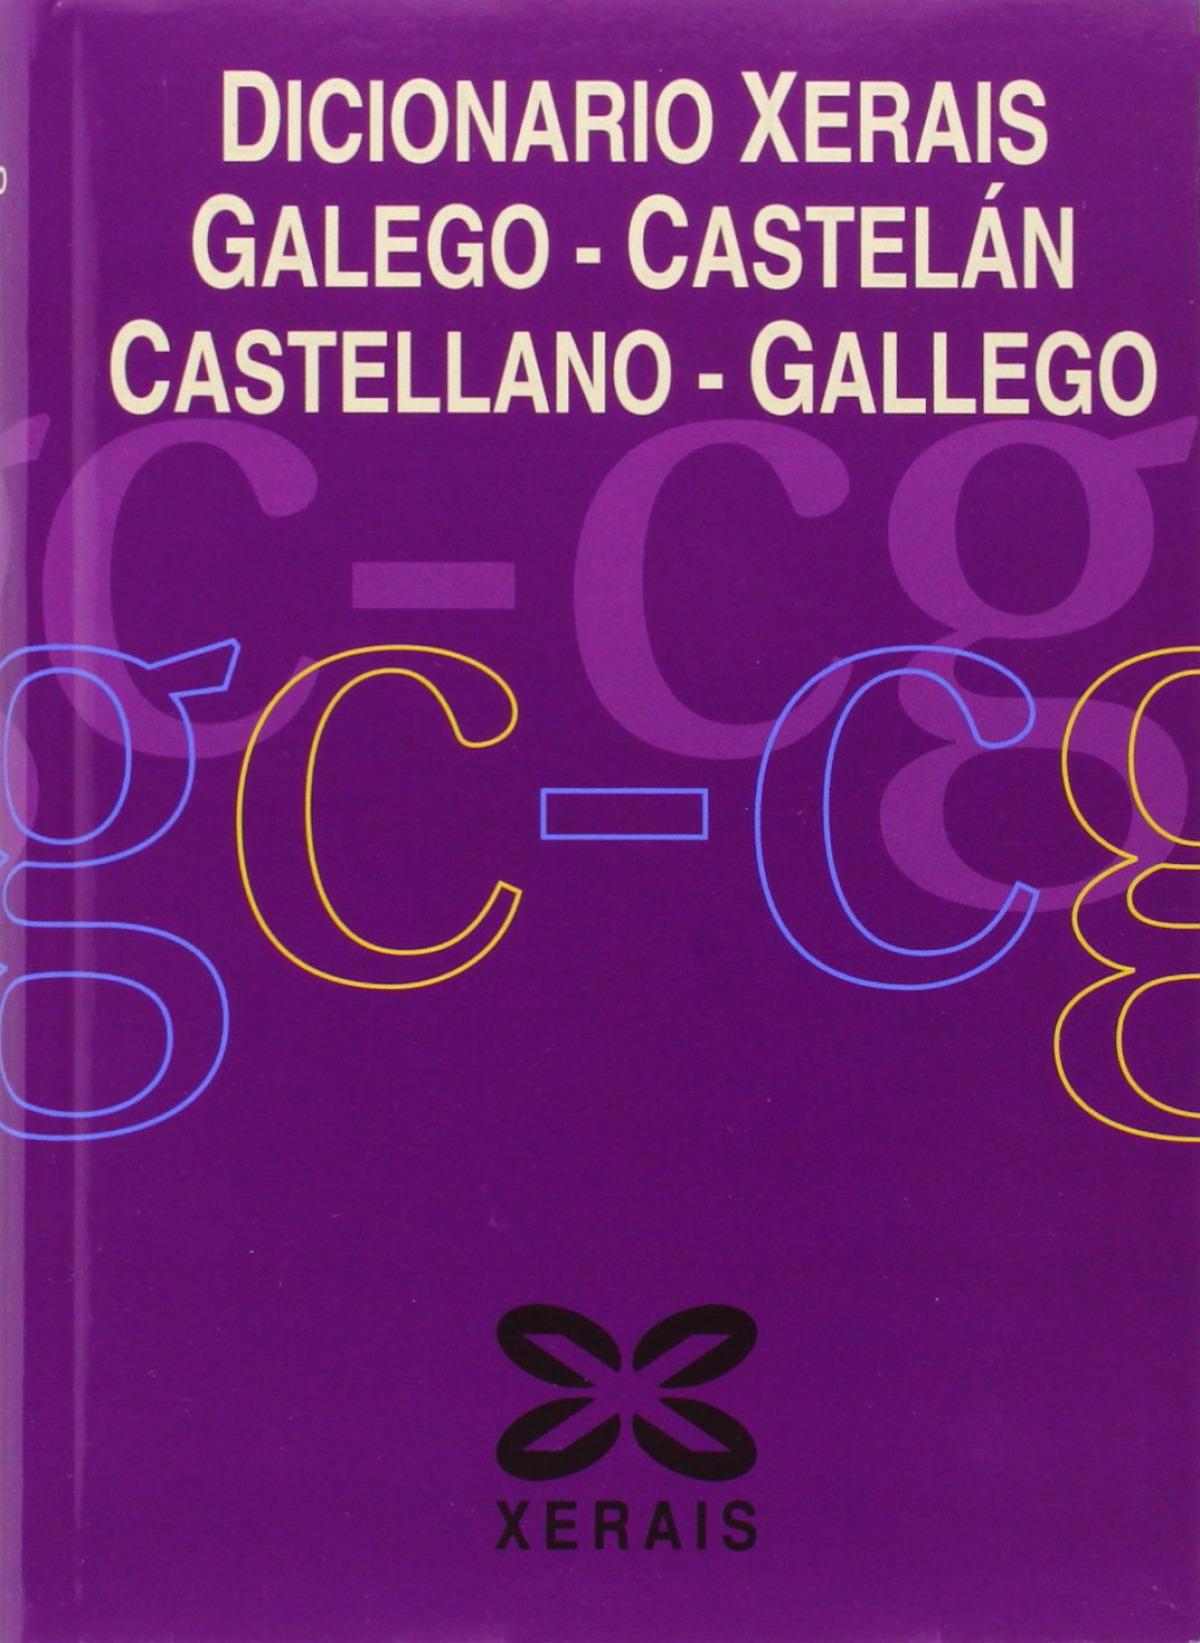 Dicionario Xerais Galego-Castelán Castellano-Gallego 9788497823197